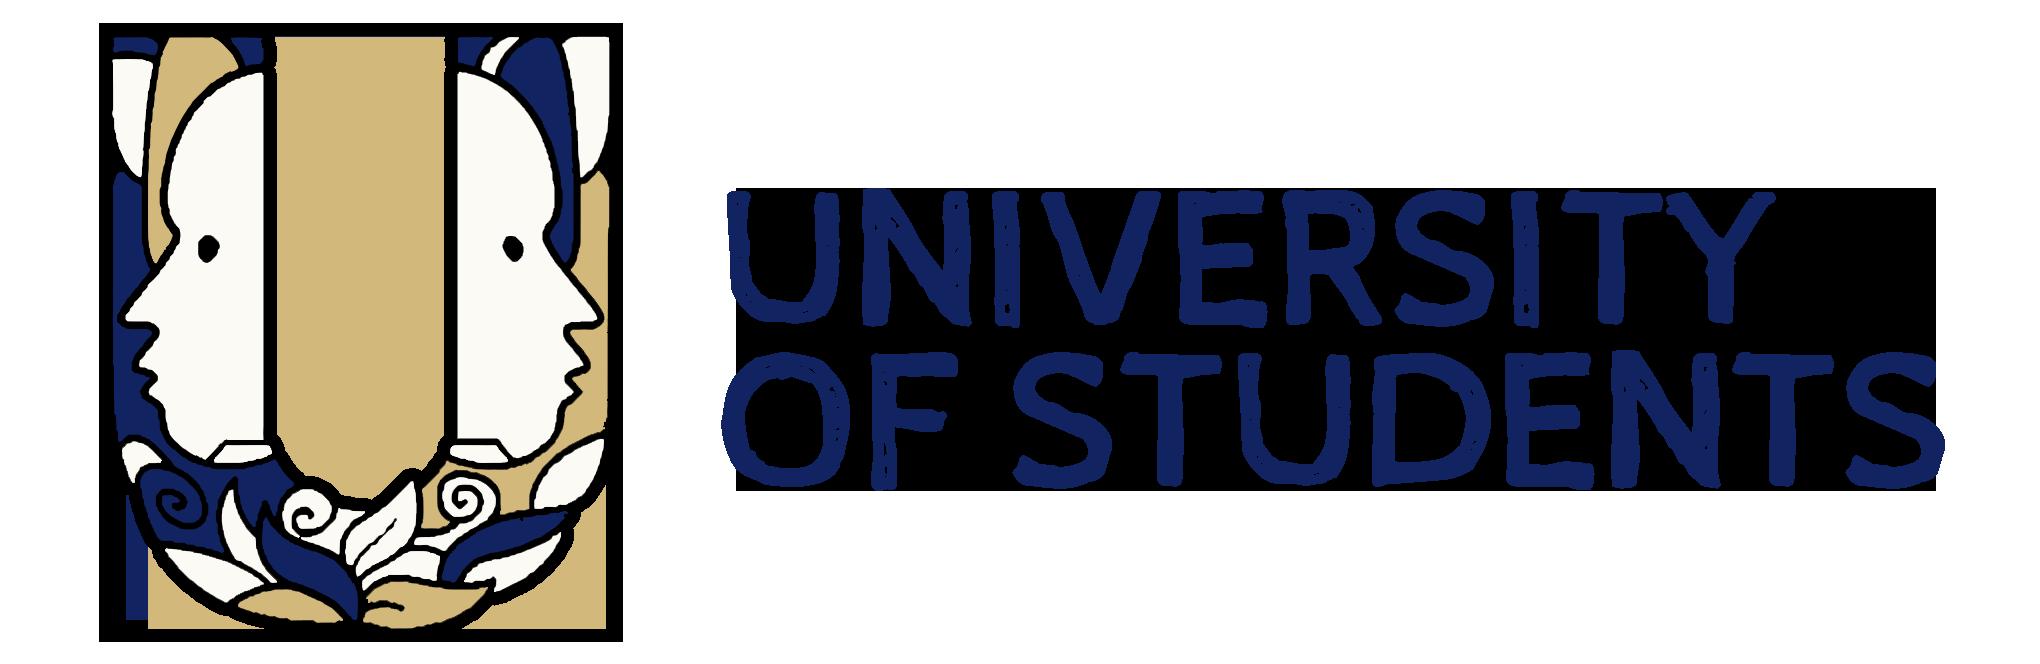 UNIVERSITY OF STUDENTS